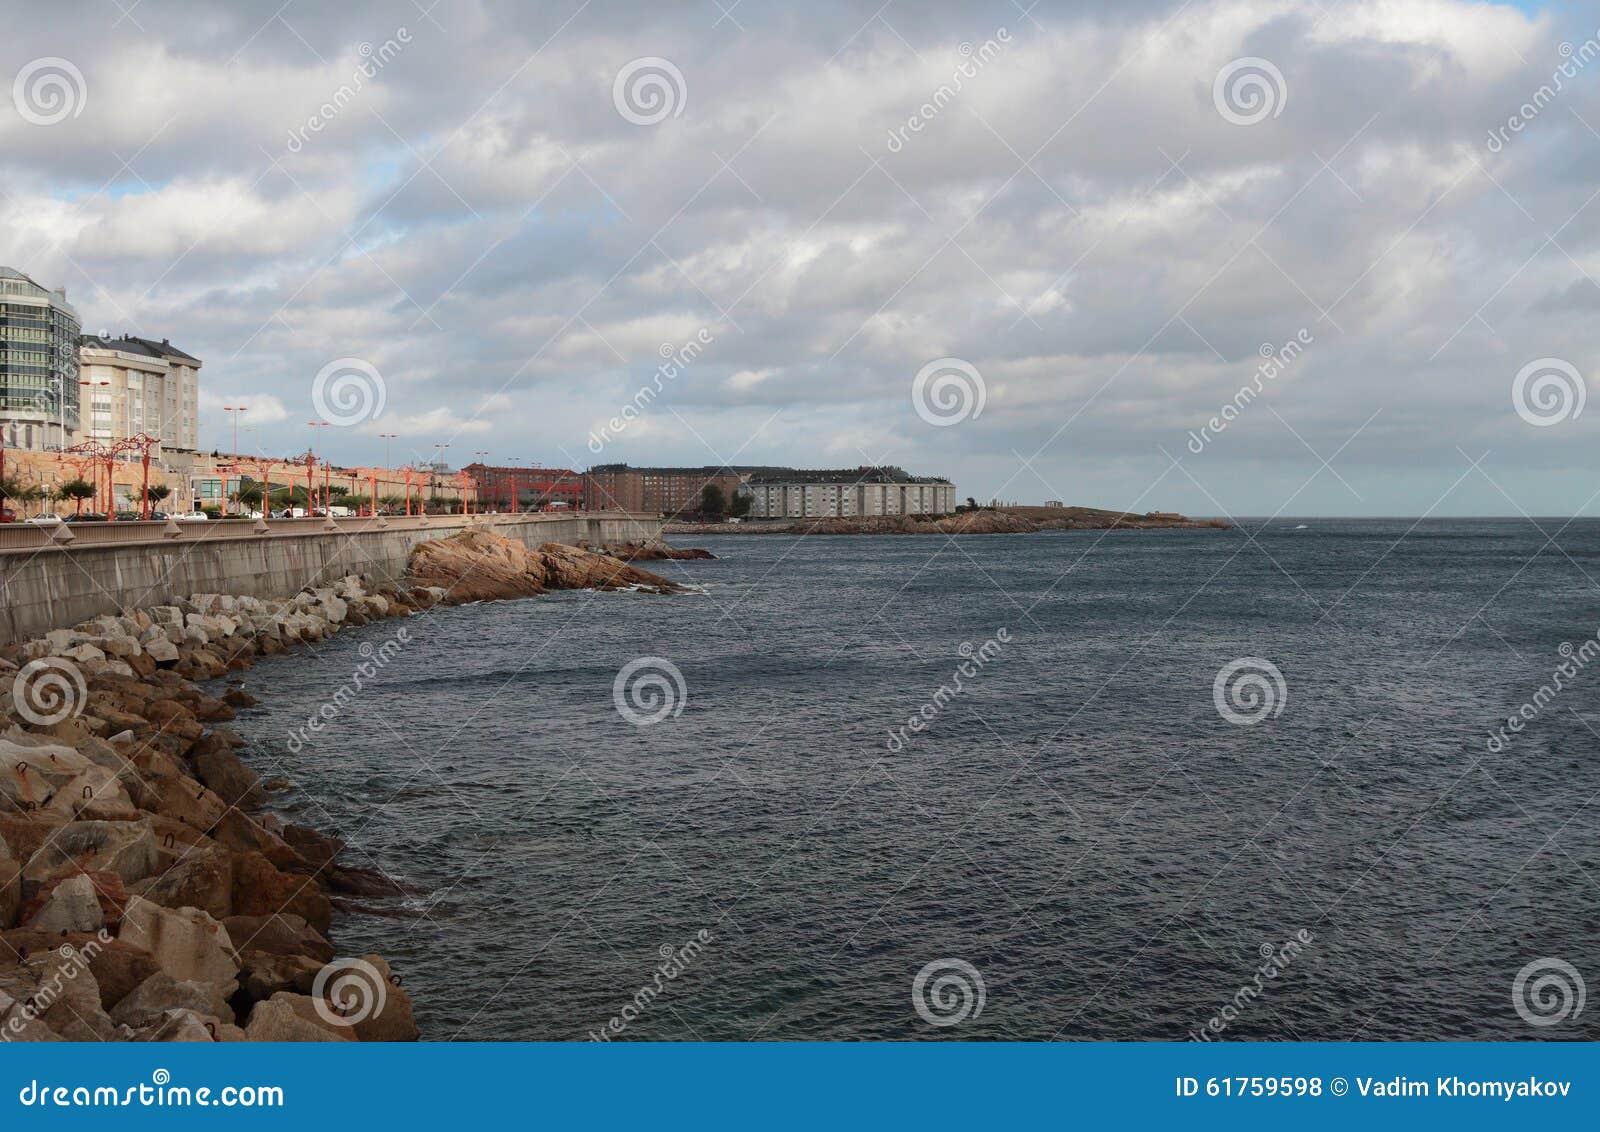 Embankment And Sea Corunna Spain Stock Photo Image